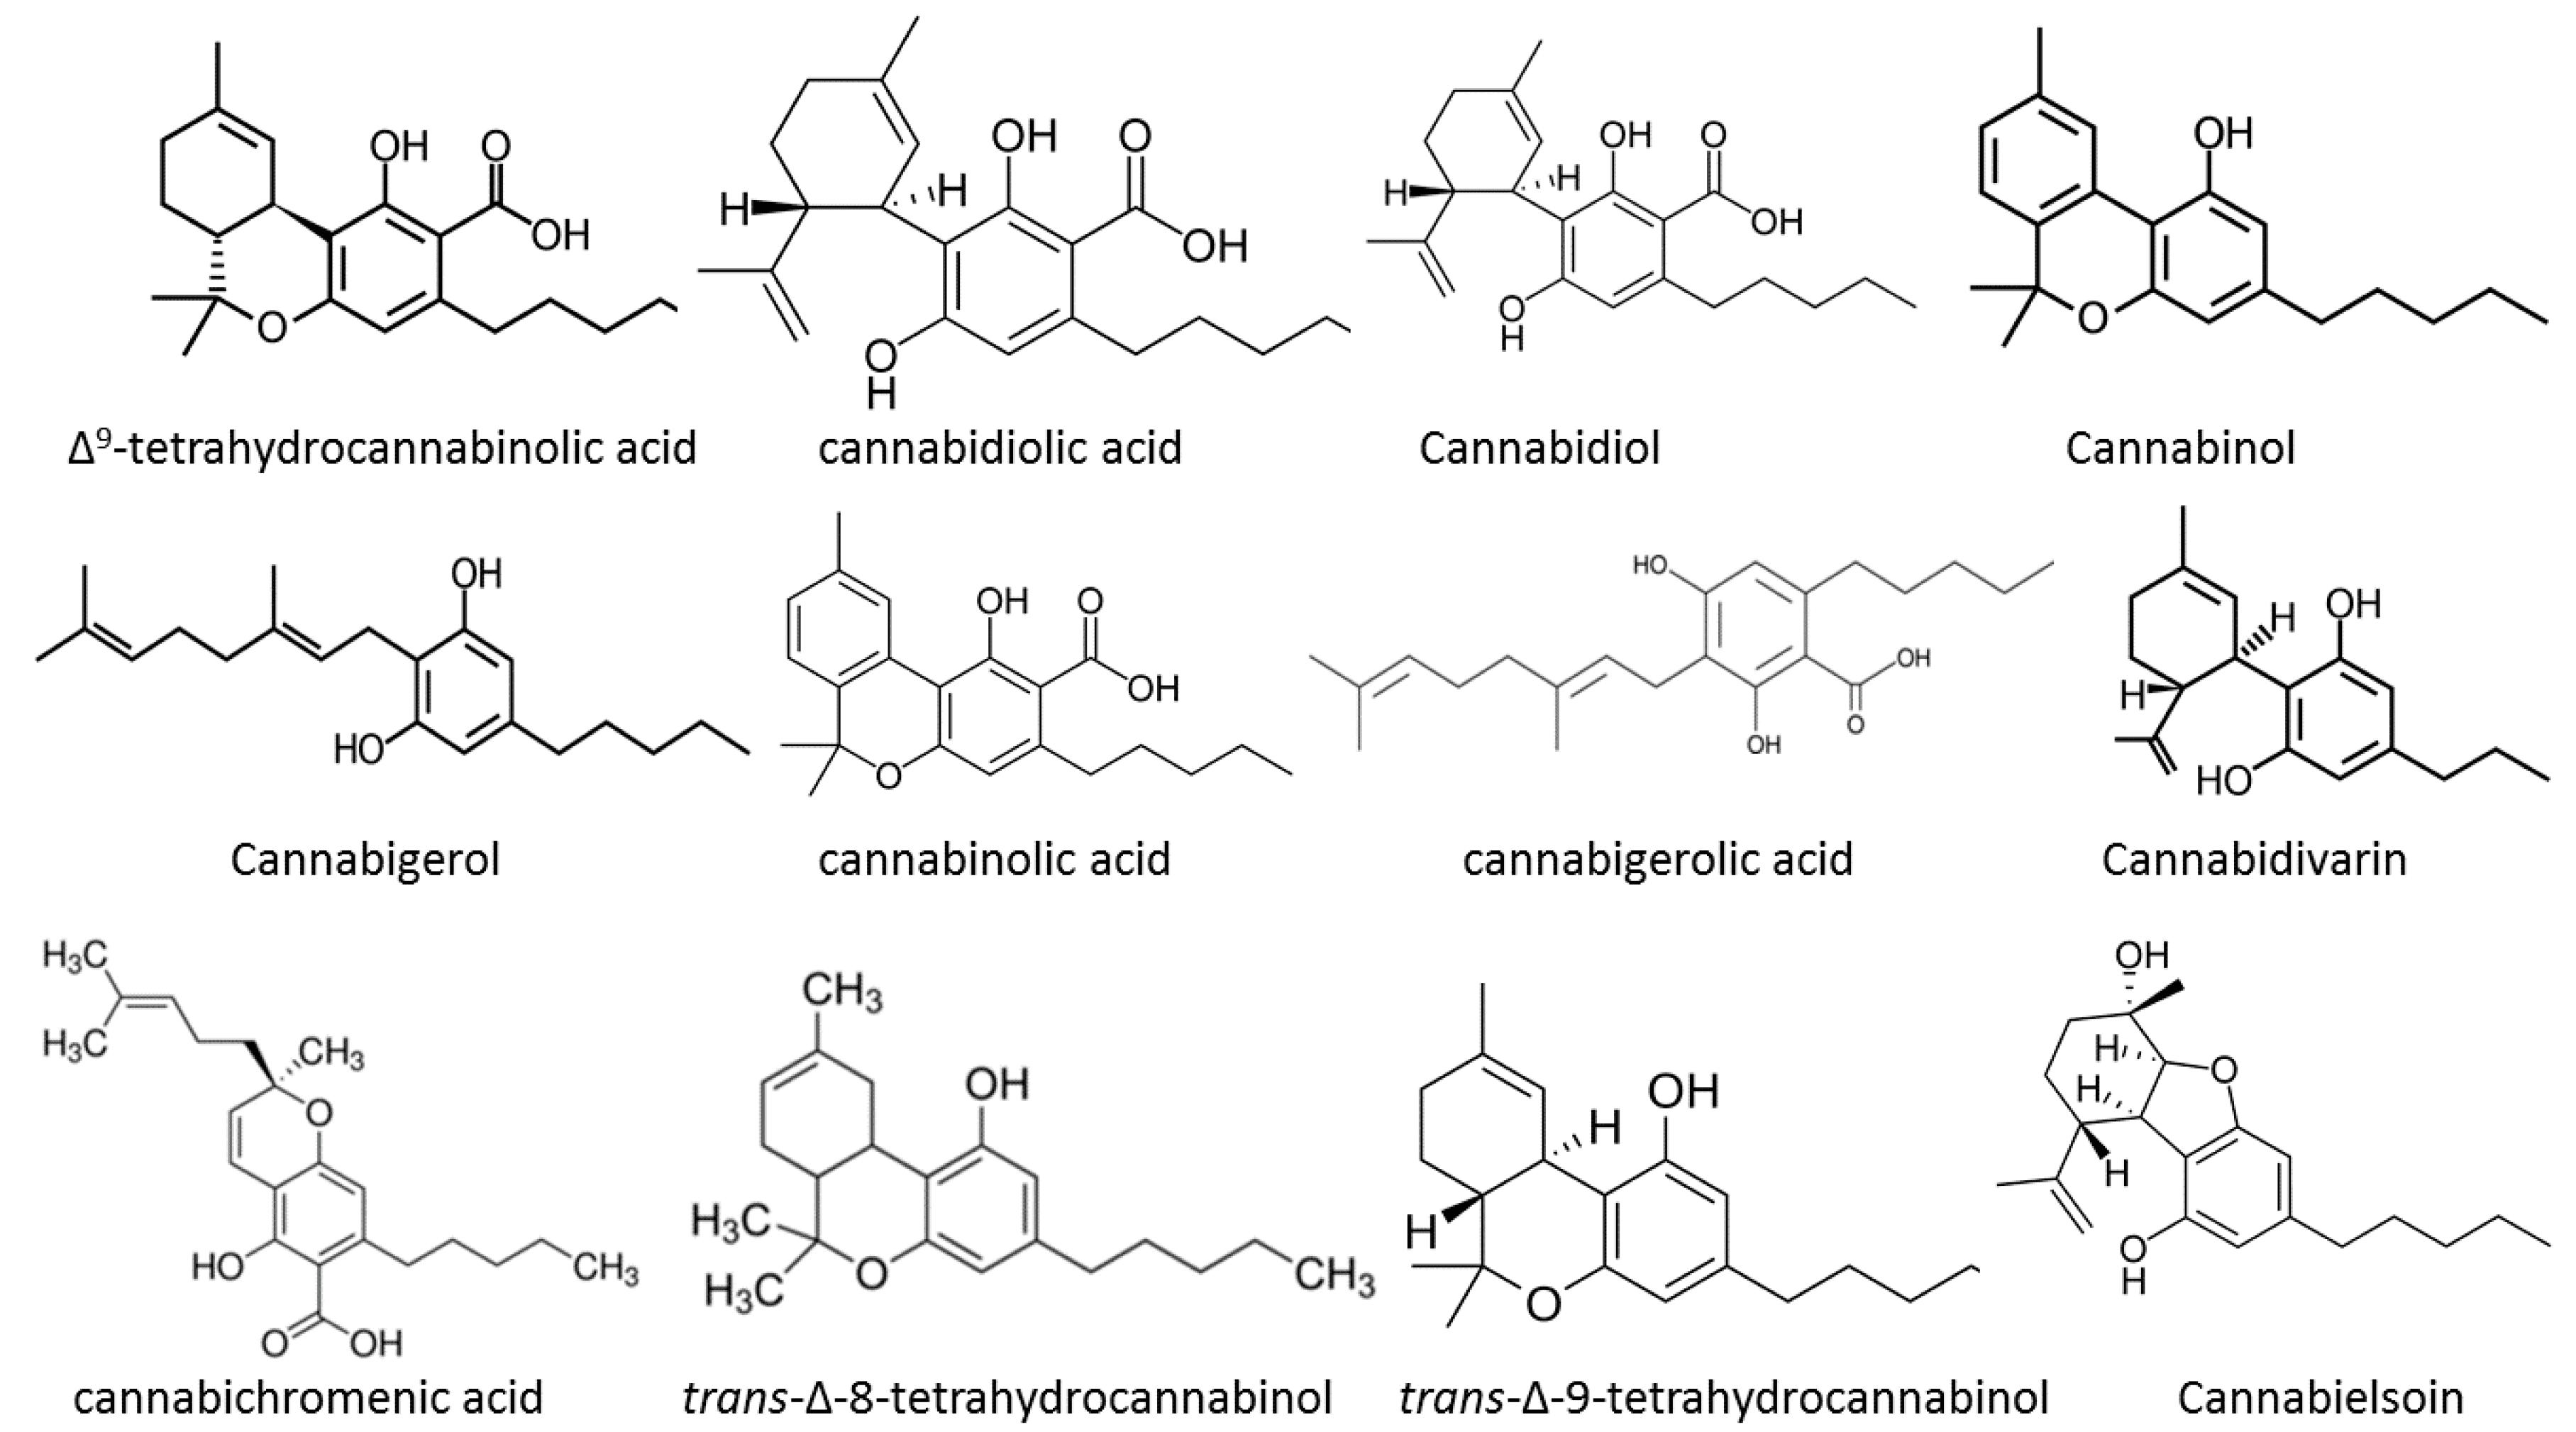 cbdv and cbgv cannabis